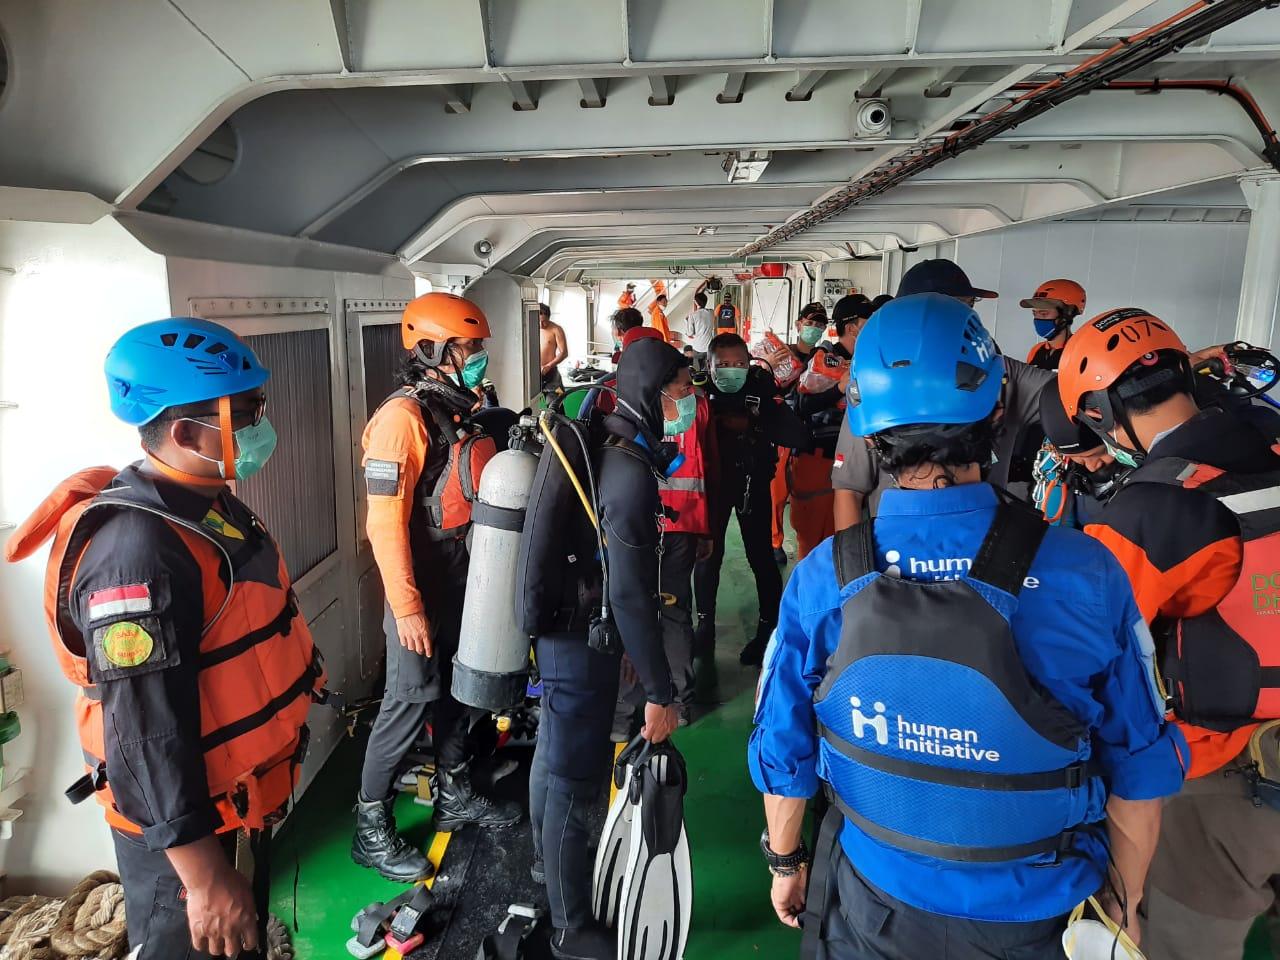 Human Initiative Helps SAR Operations to Search SJ-182 Sriwijaya Air Crash Victims